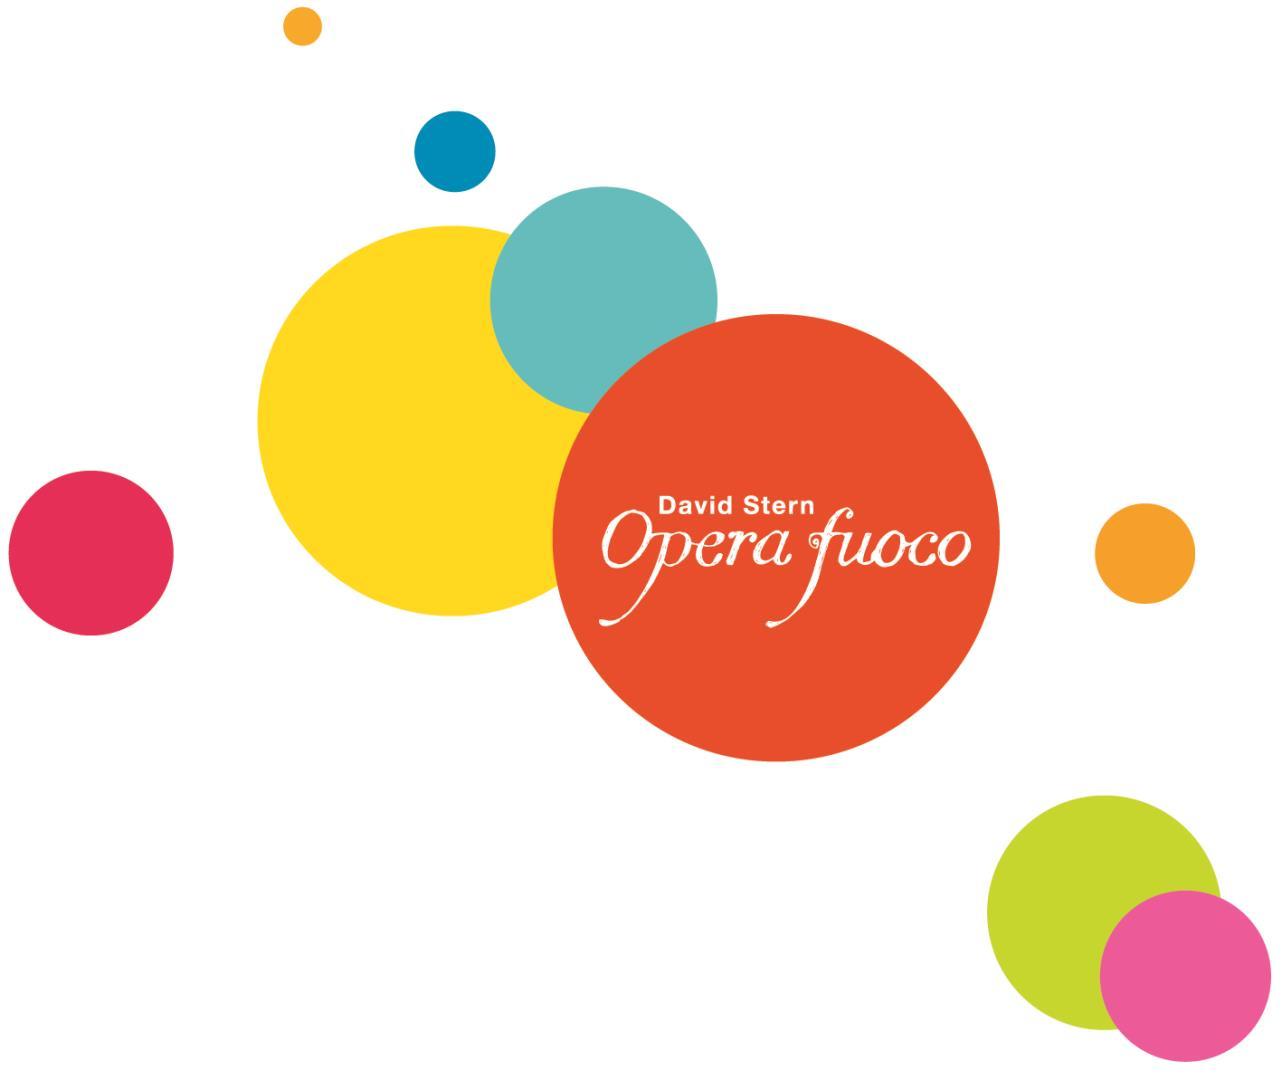 Association - Opera Fuoco